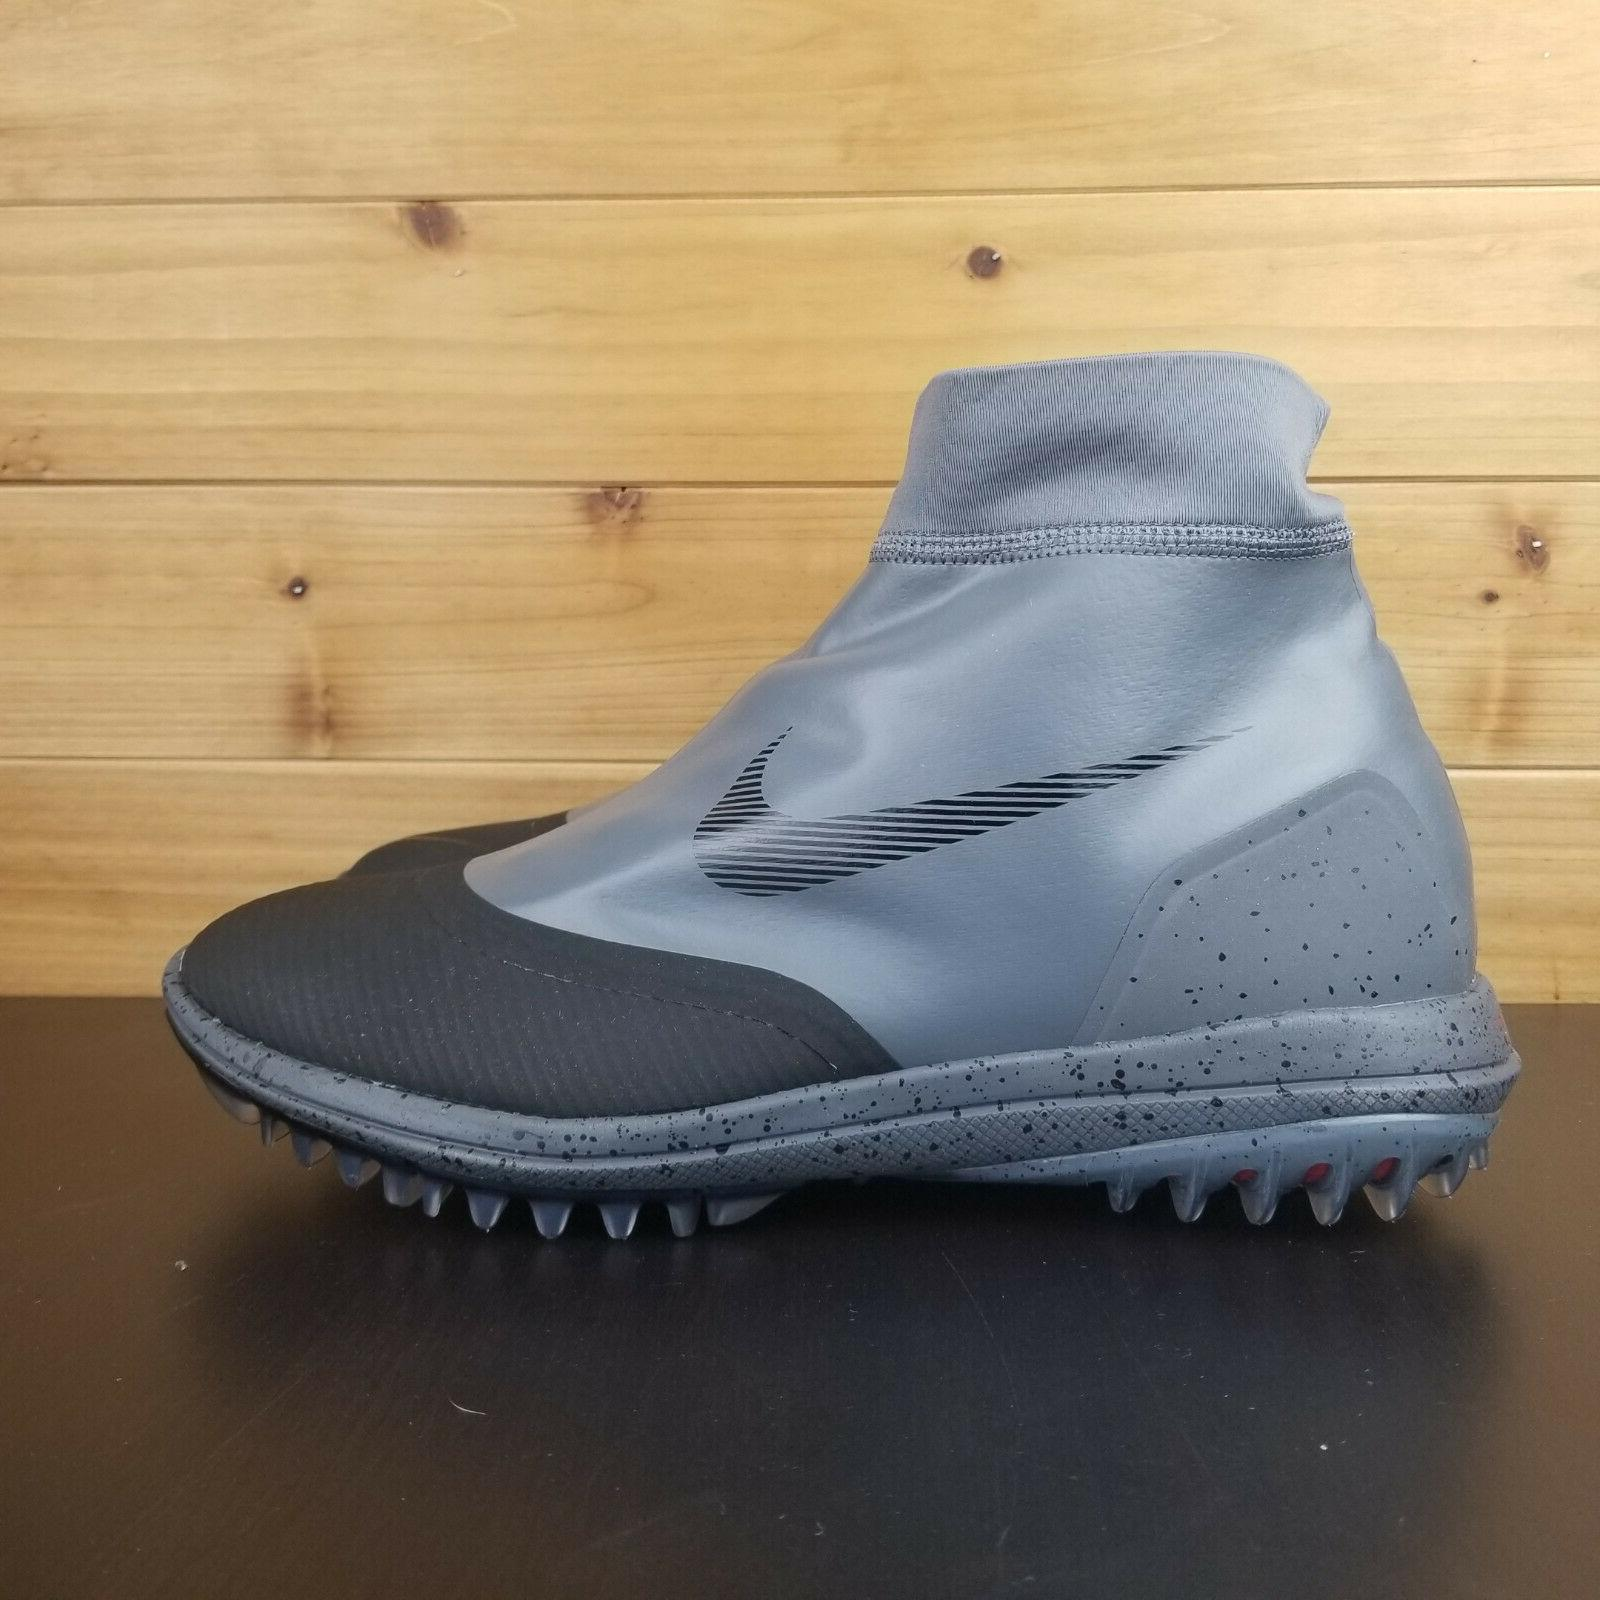 Nike Lunar Vaporstorm Shoes Gray 918623-003 Men's Wide Waterproof